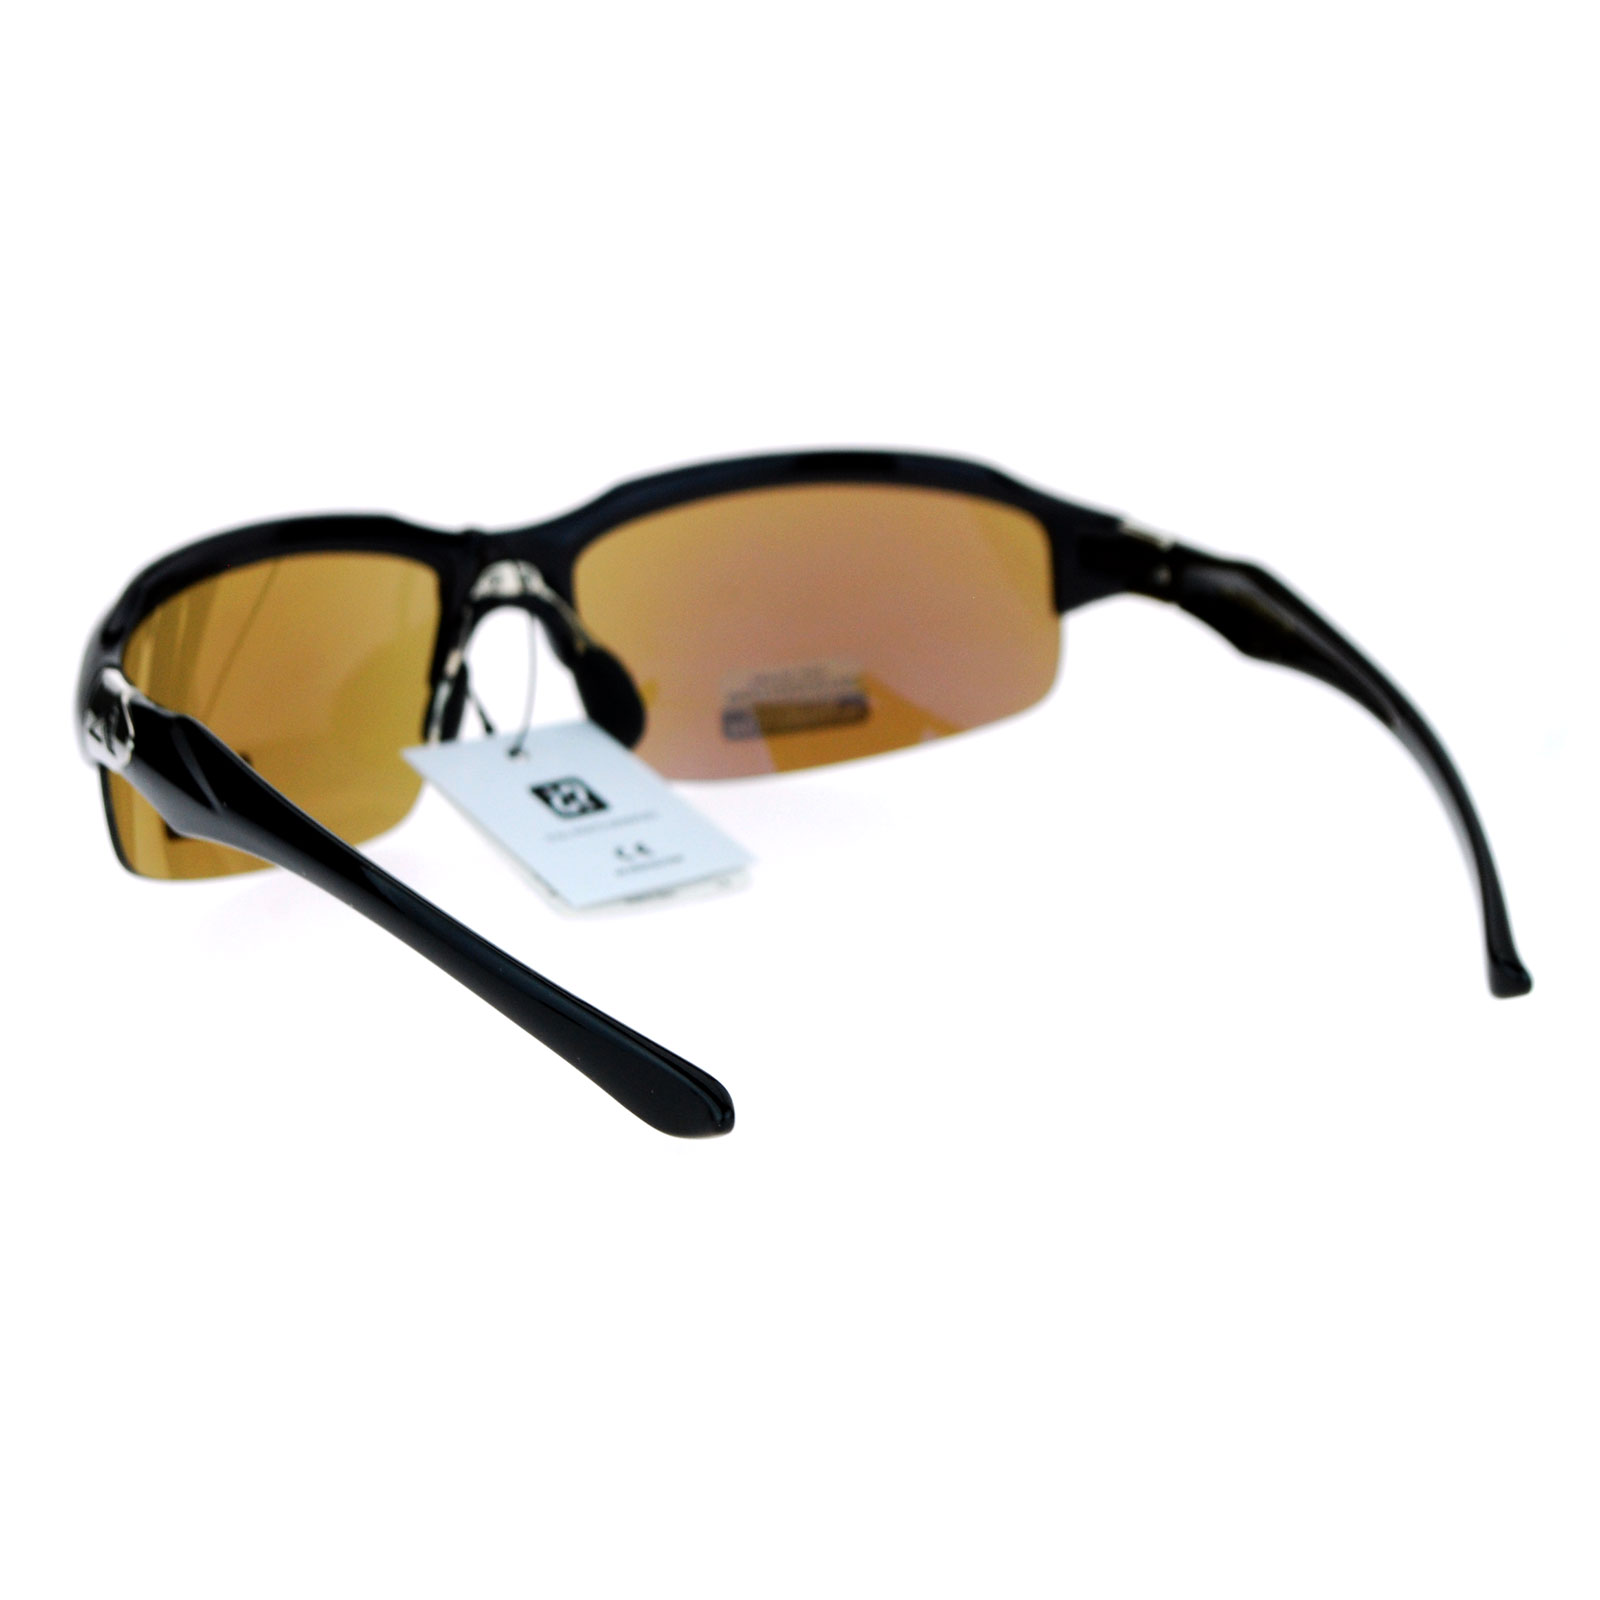 mirrored sport sunglasses  Arctic Blue Bluetech Mirrored Lens Baseball Half Rim Sport ...